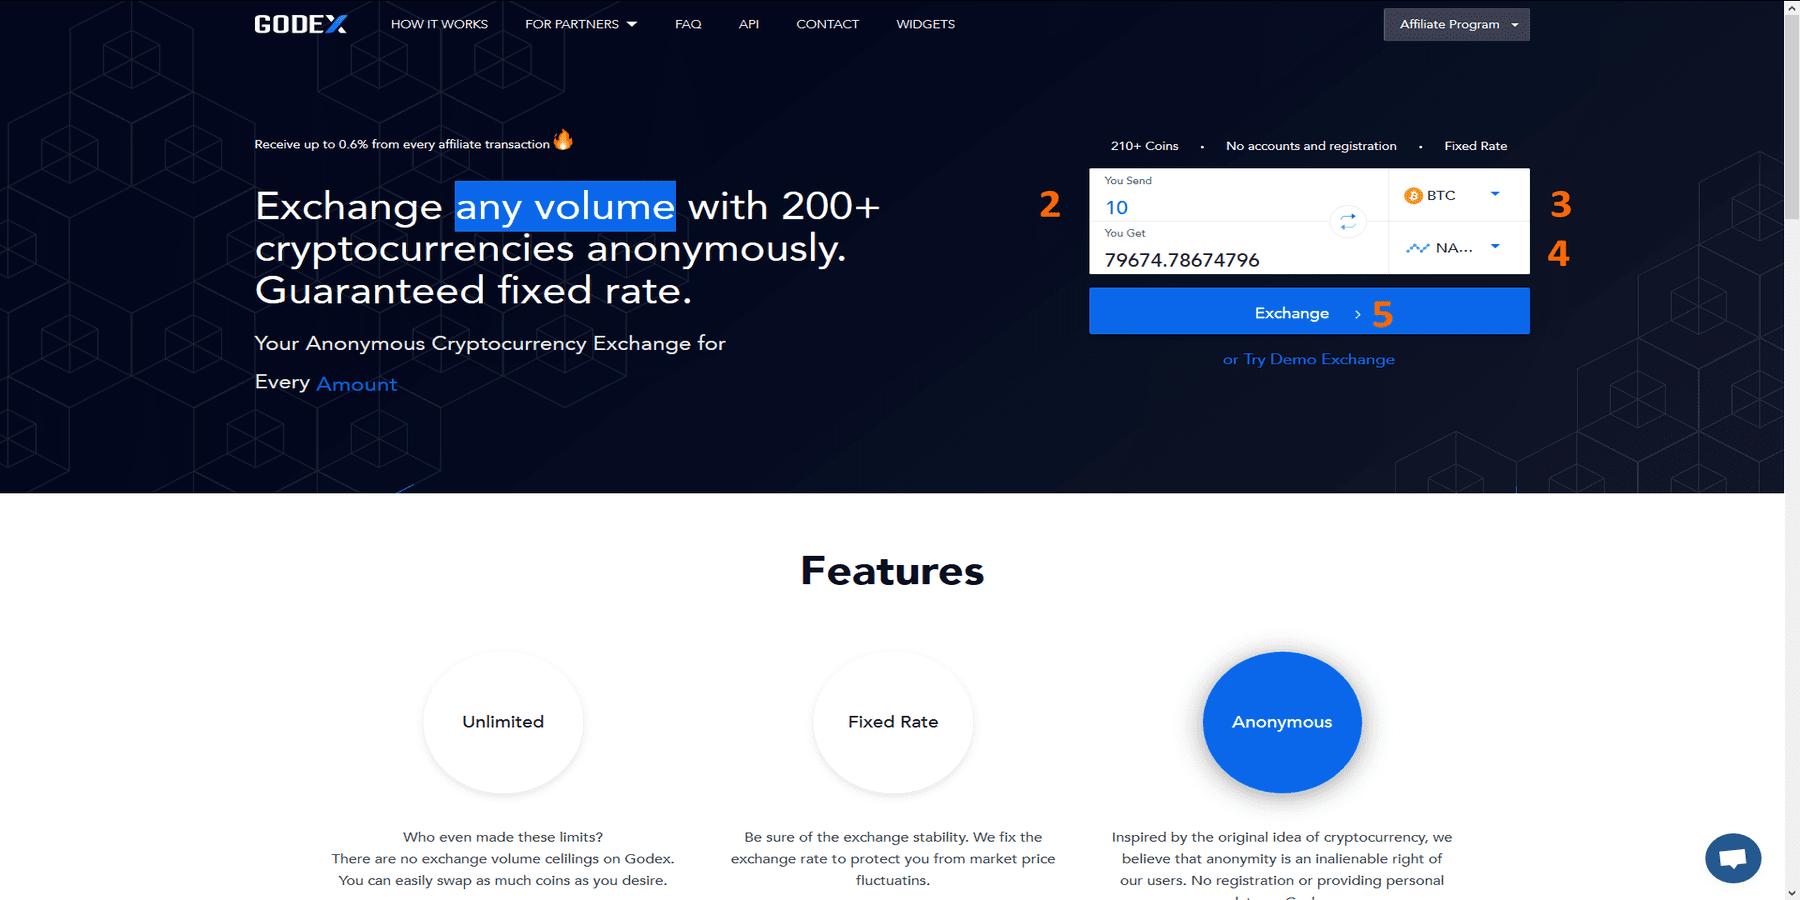 Trading sur Godex